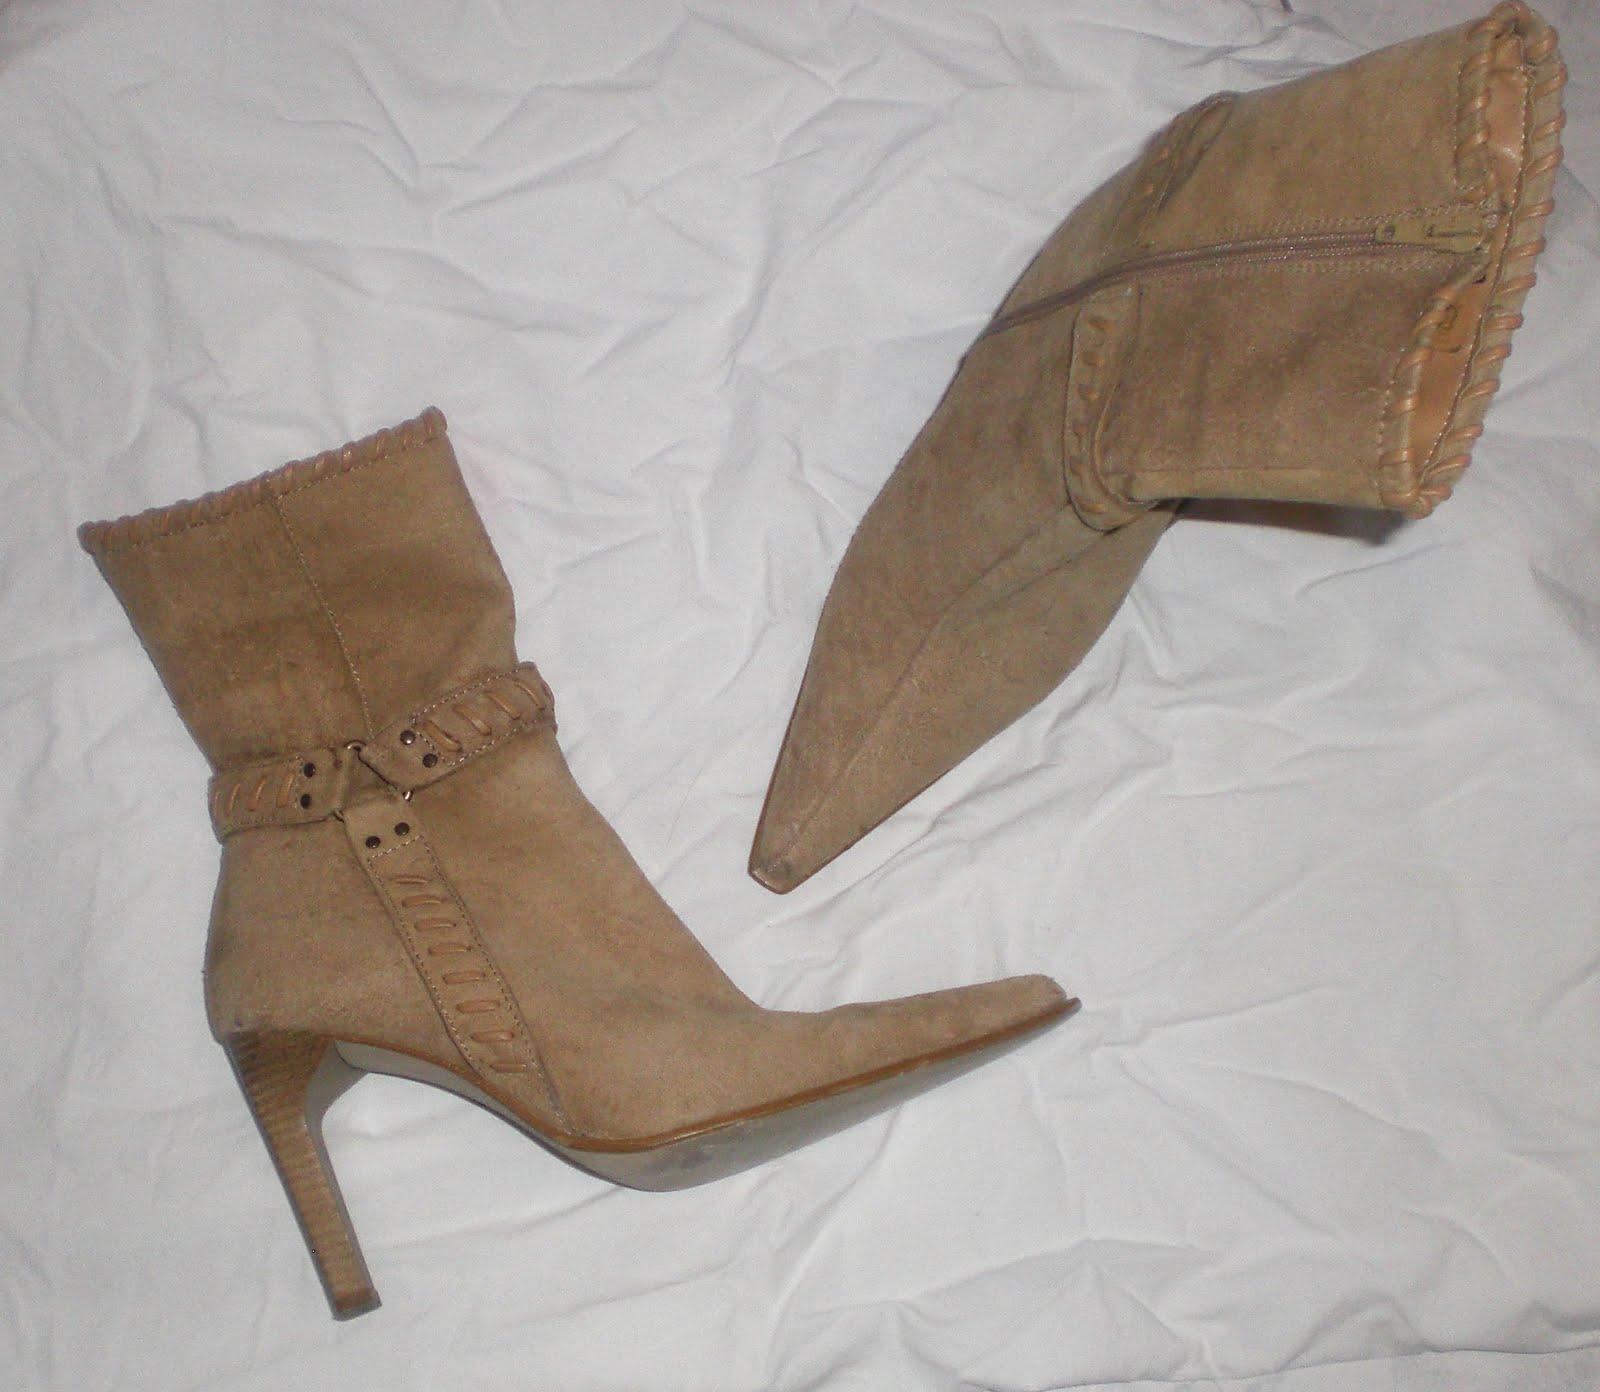 Miss coco vide son dressing montpellier h rault 34 bottes en daim bata taille 38 - Vide dressing montpellier ...